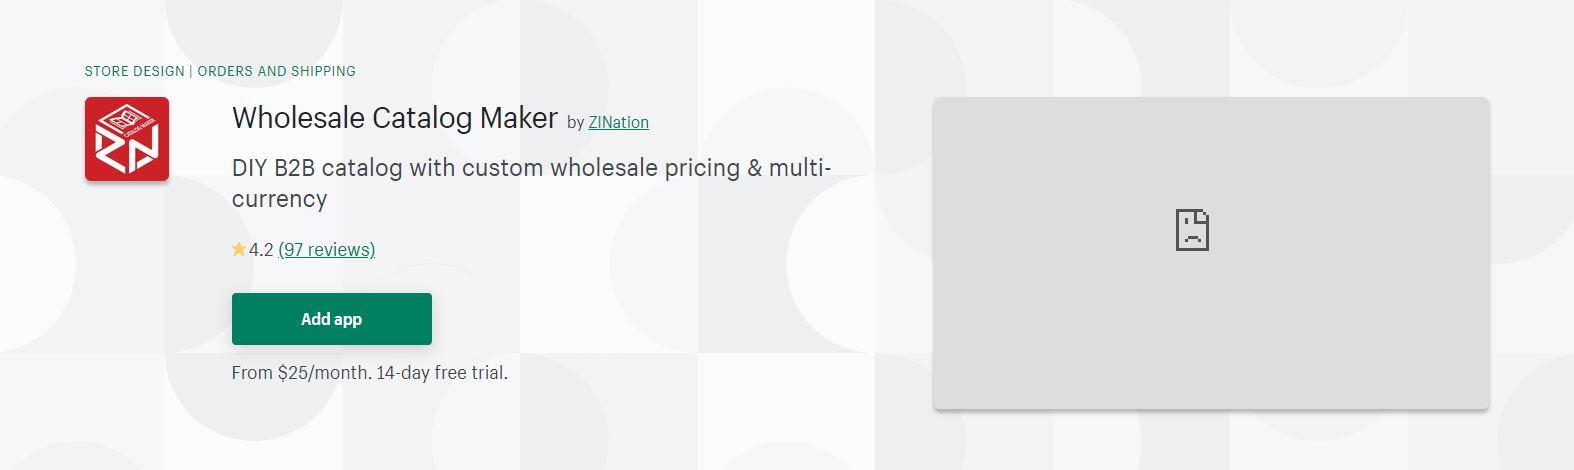 Wholesale Catalog Maker